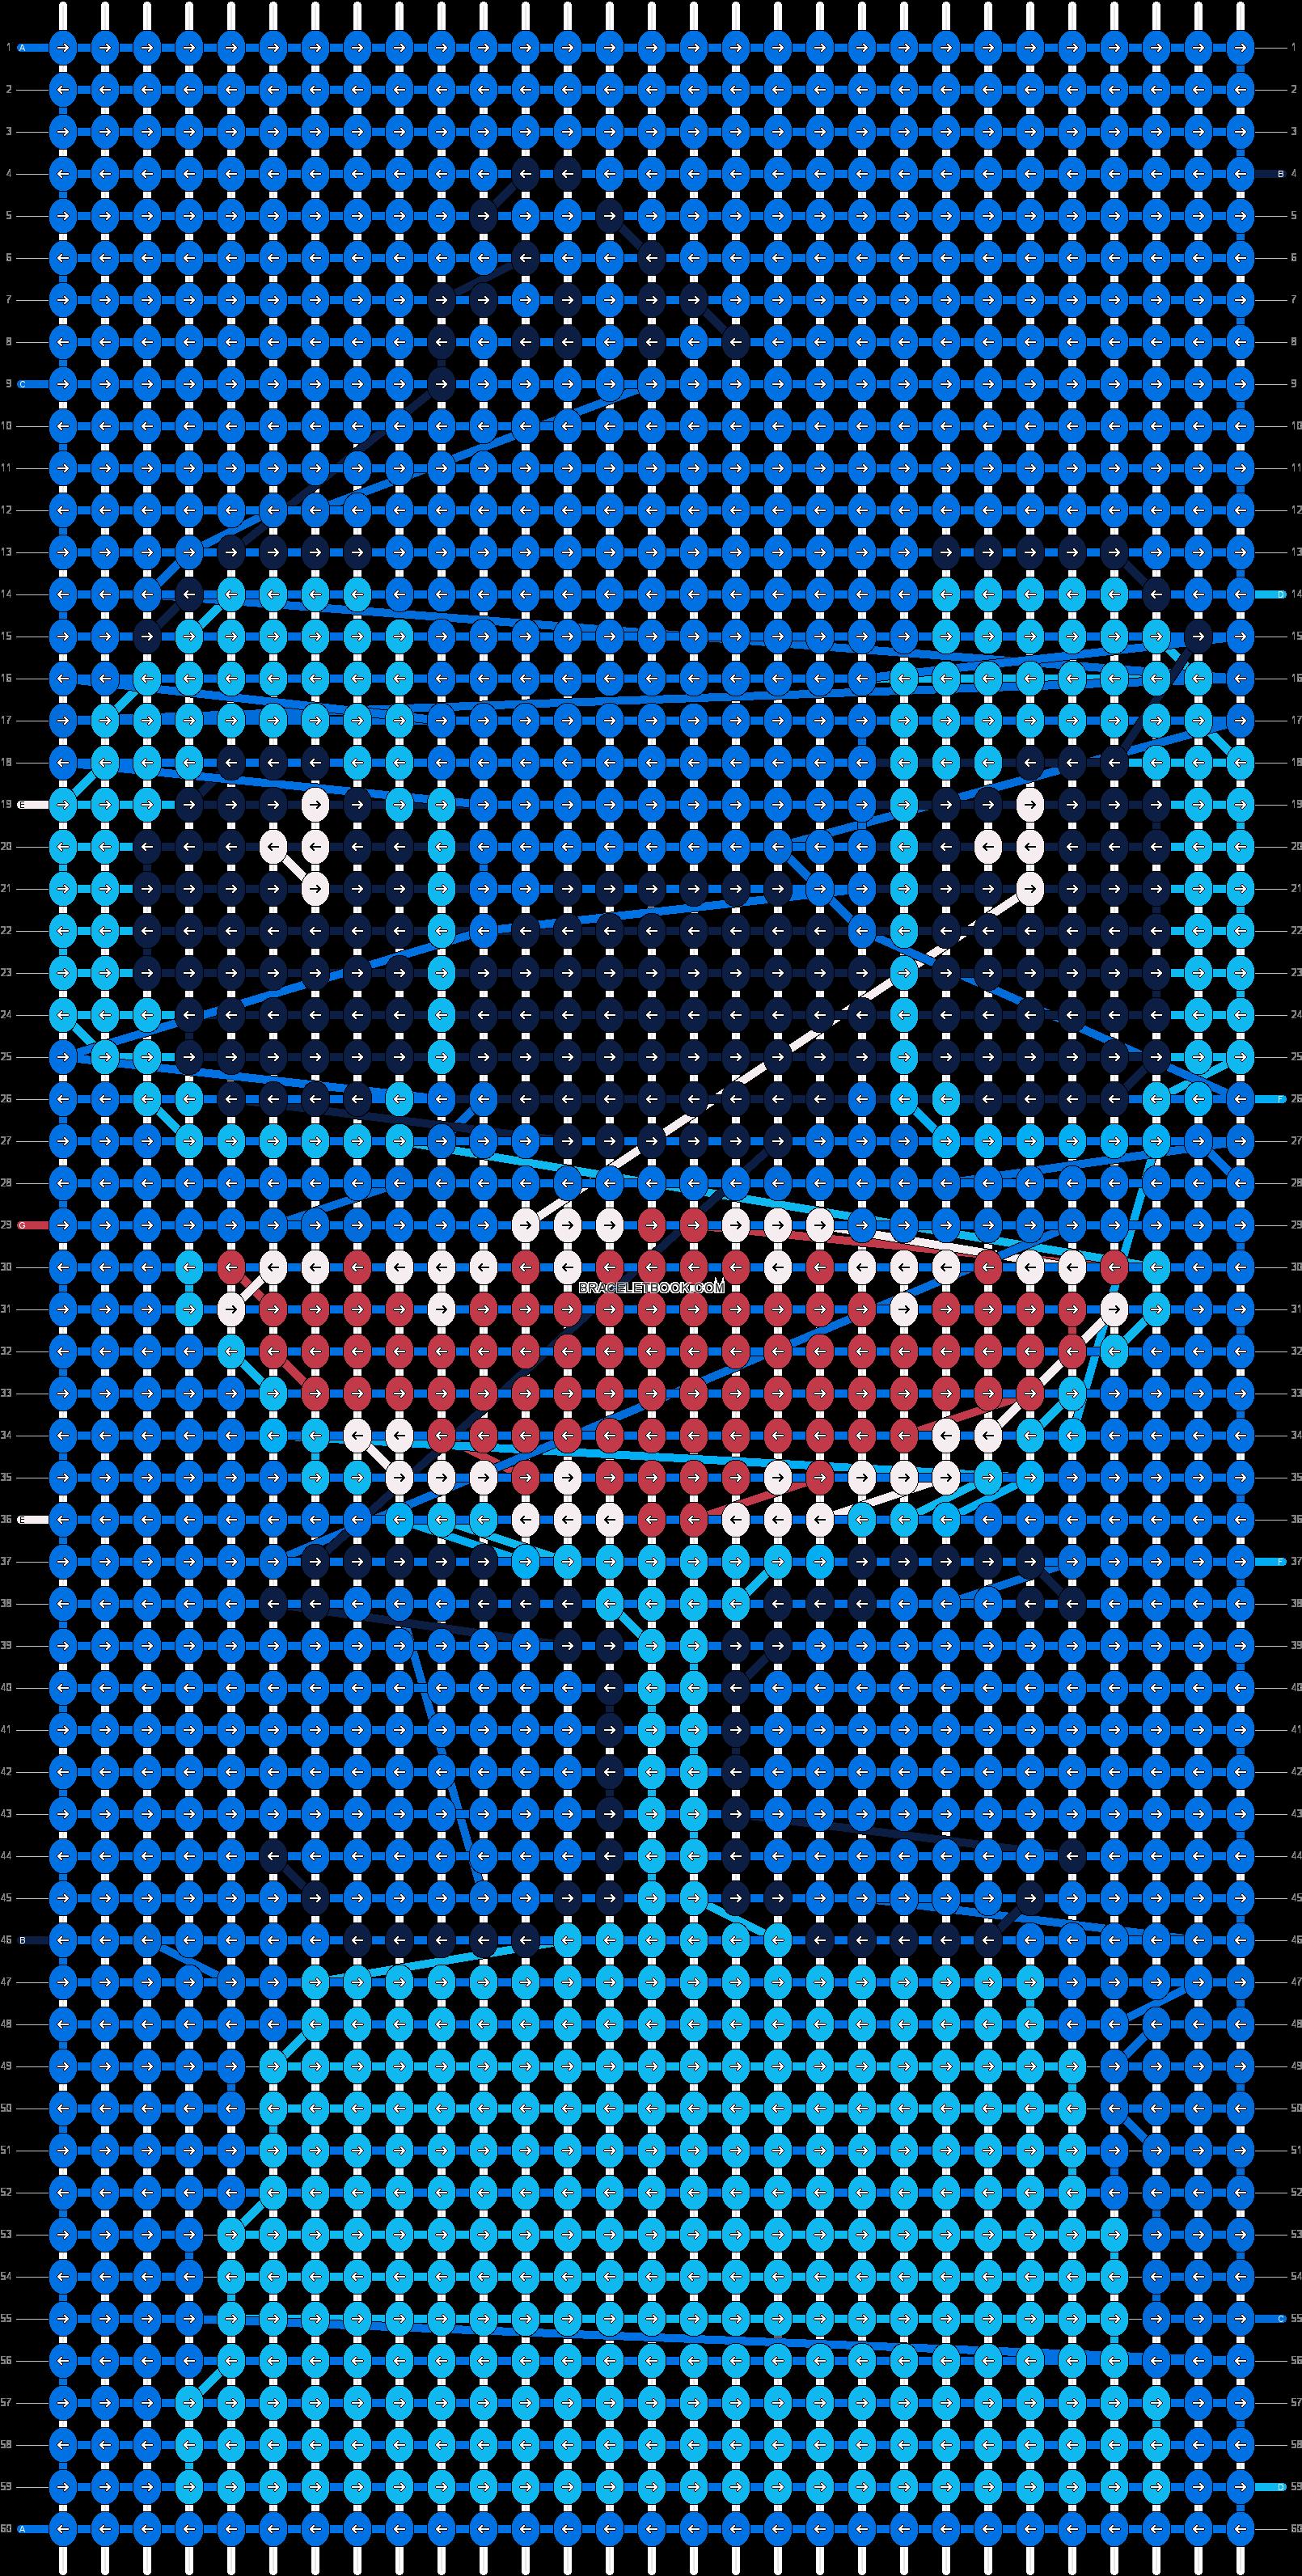 Download Pattern Stitch Friendship Bracelet Patterns Full Size Png Image Pngkit